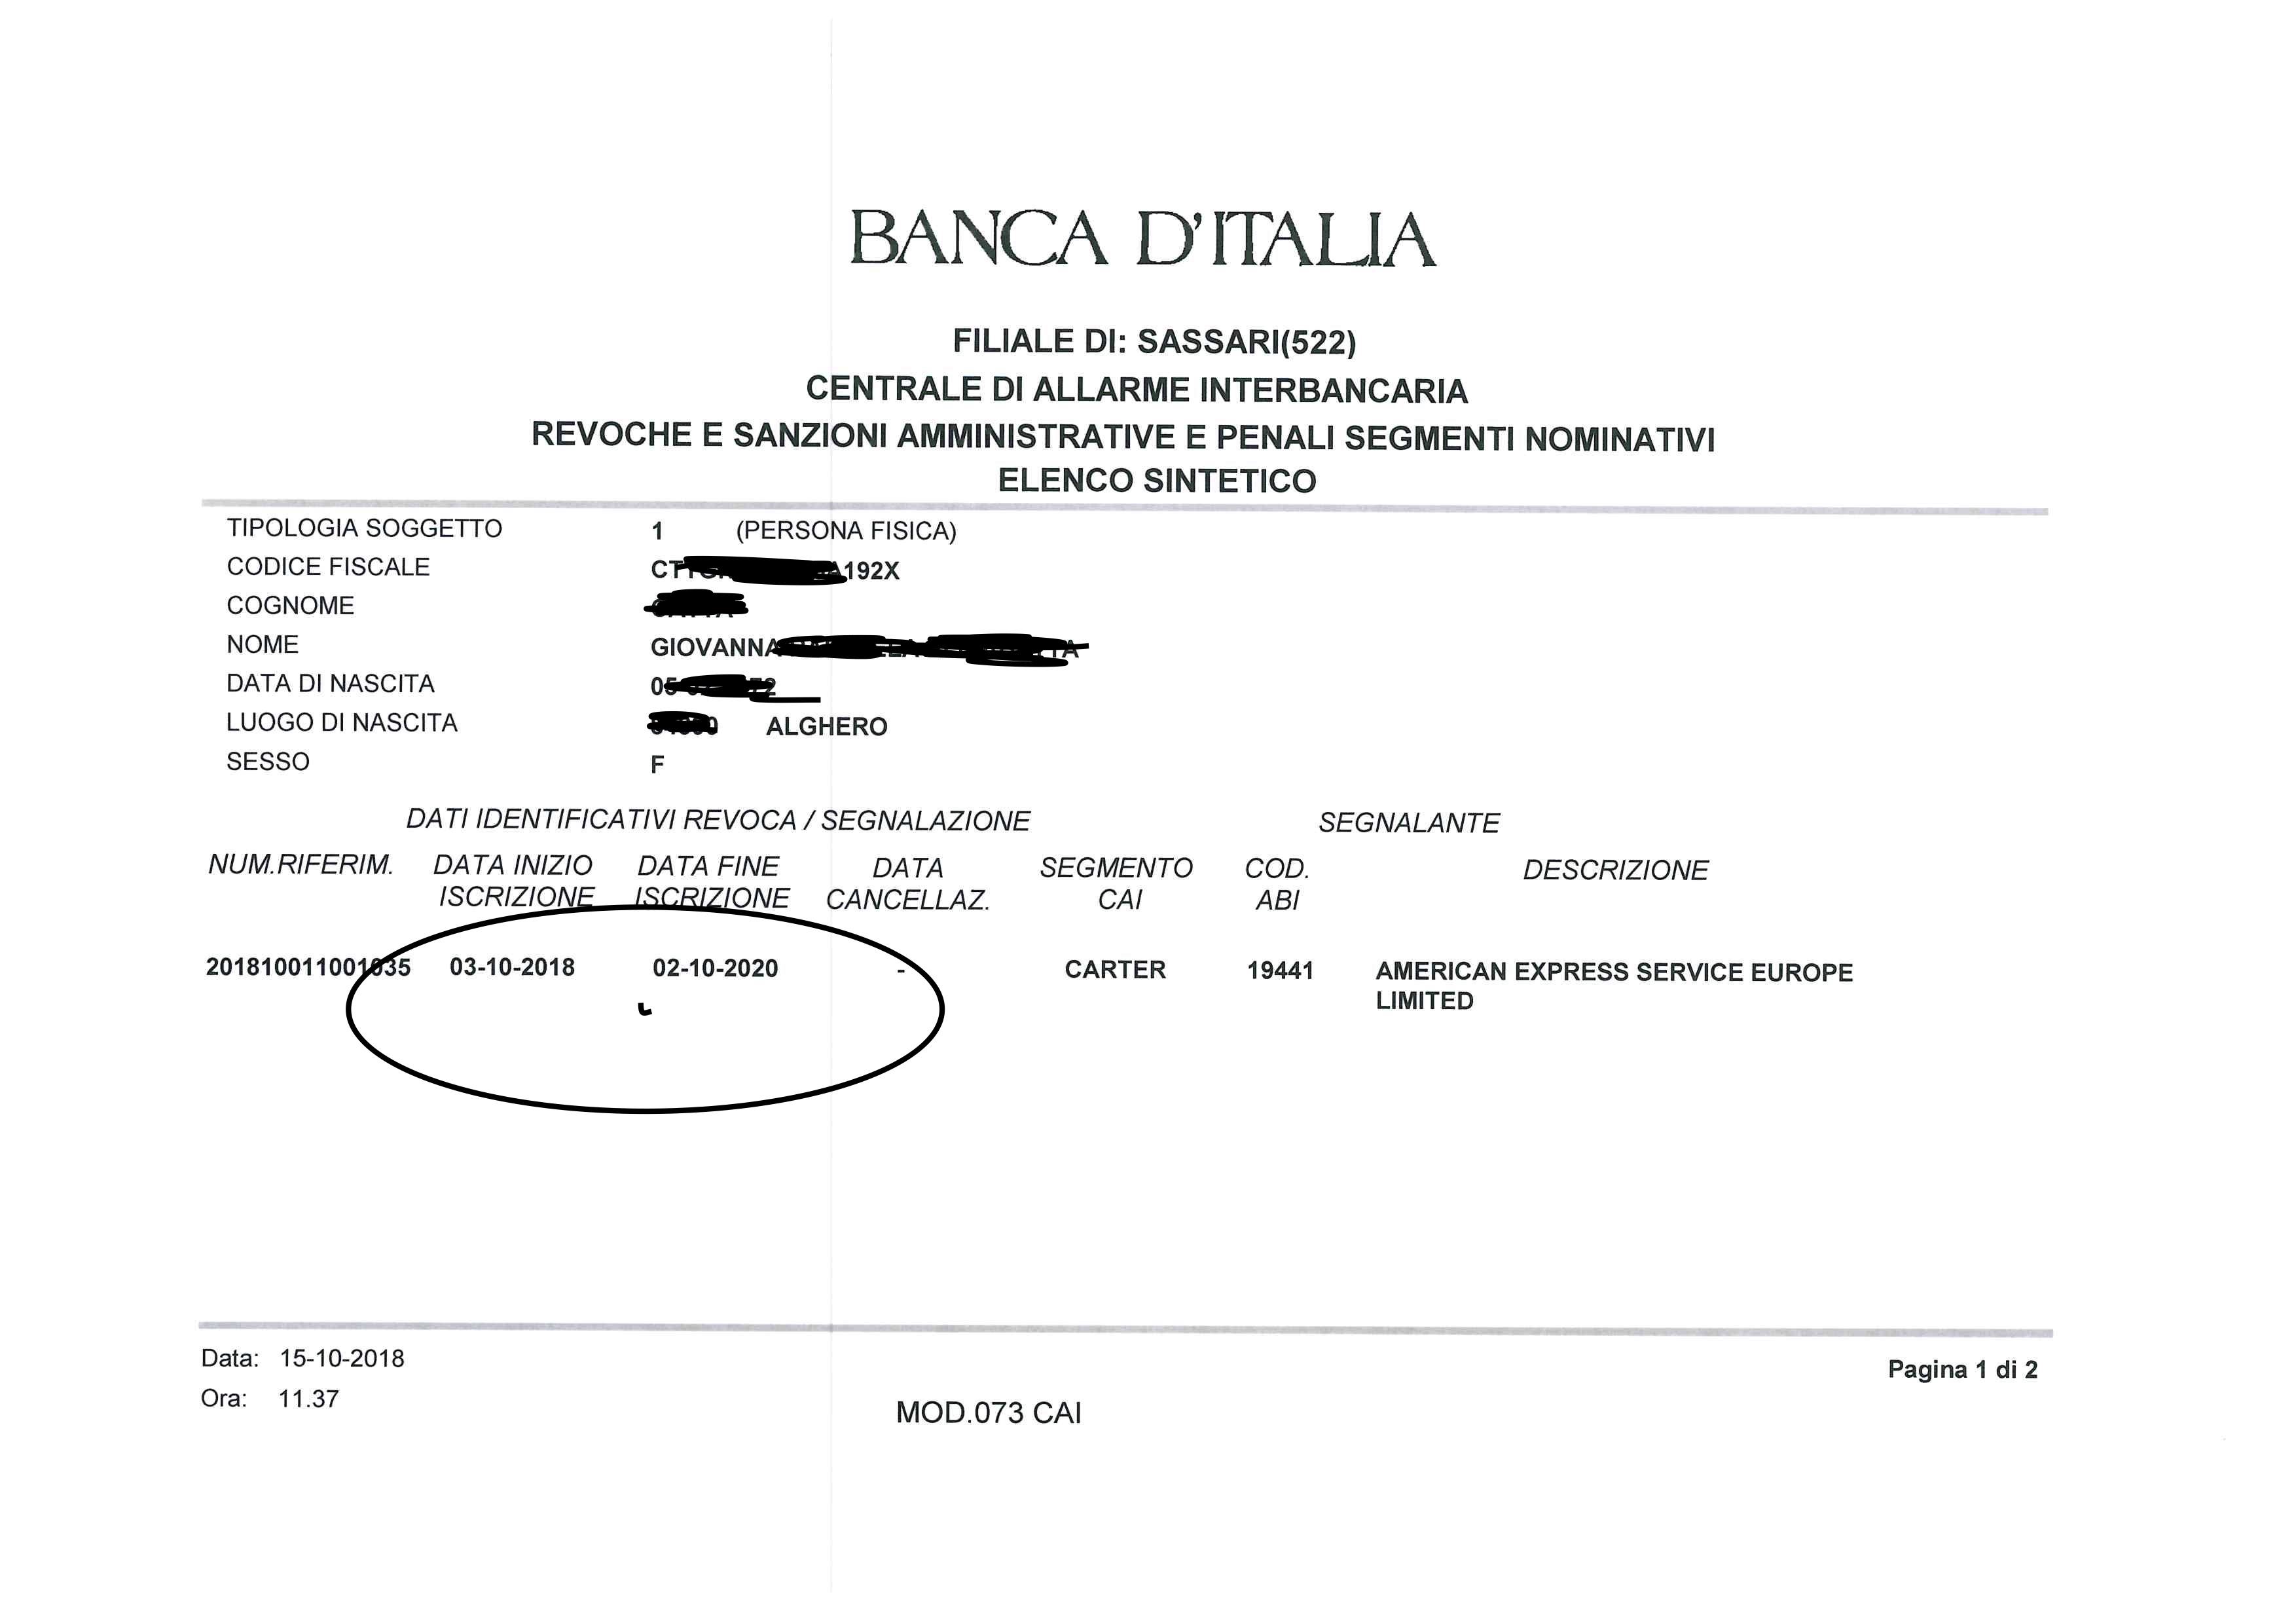 LUCA PACINI, SEGNALAZIONE CAI CARTER